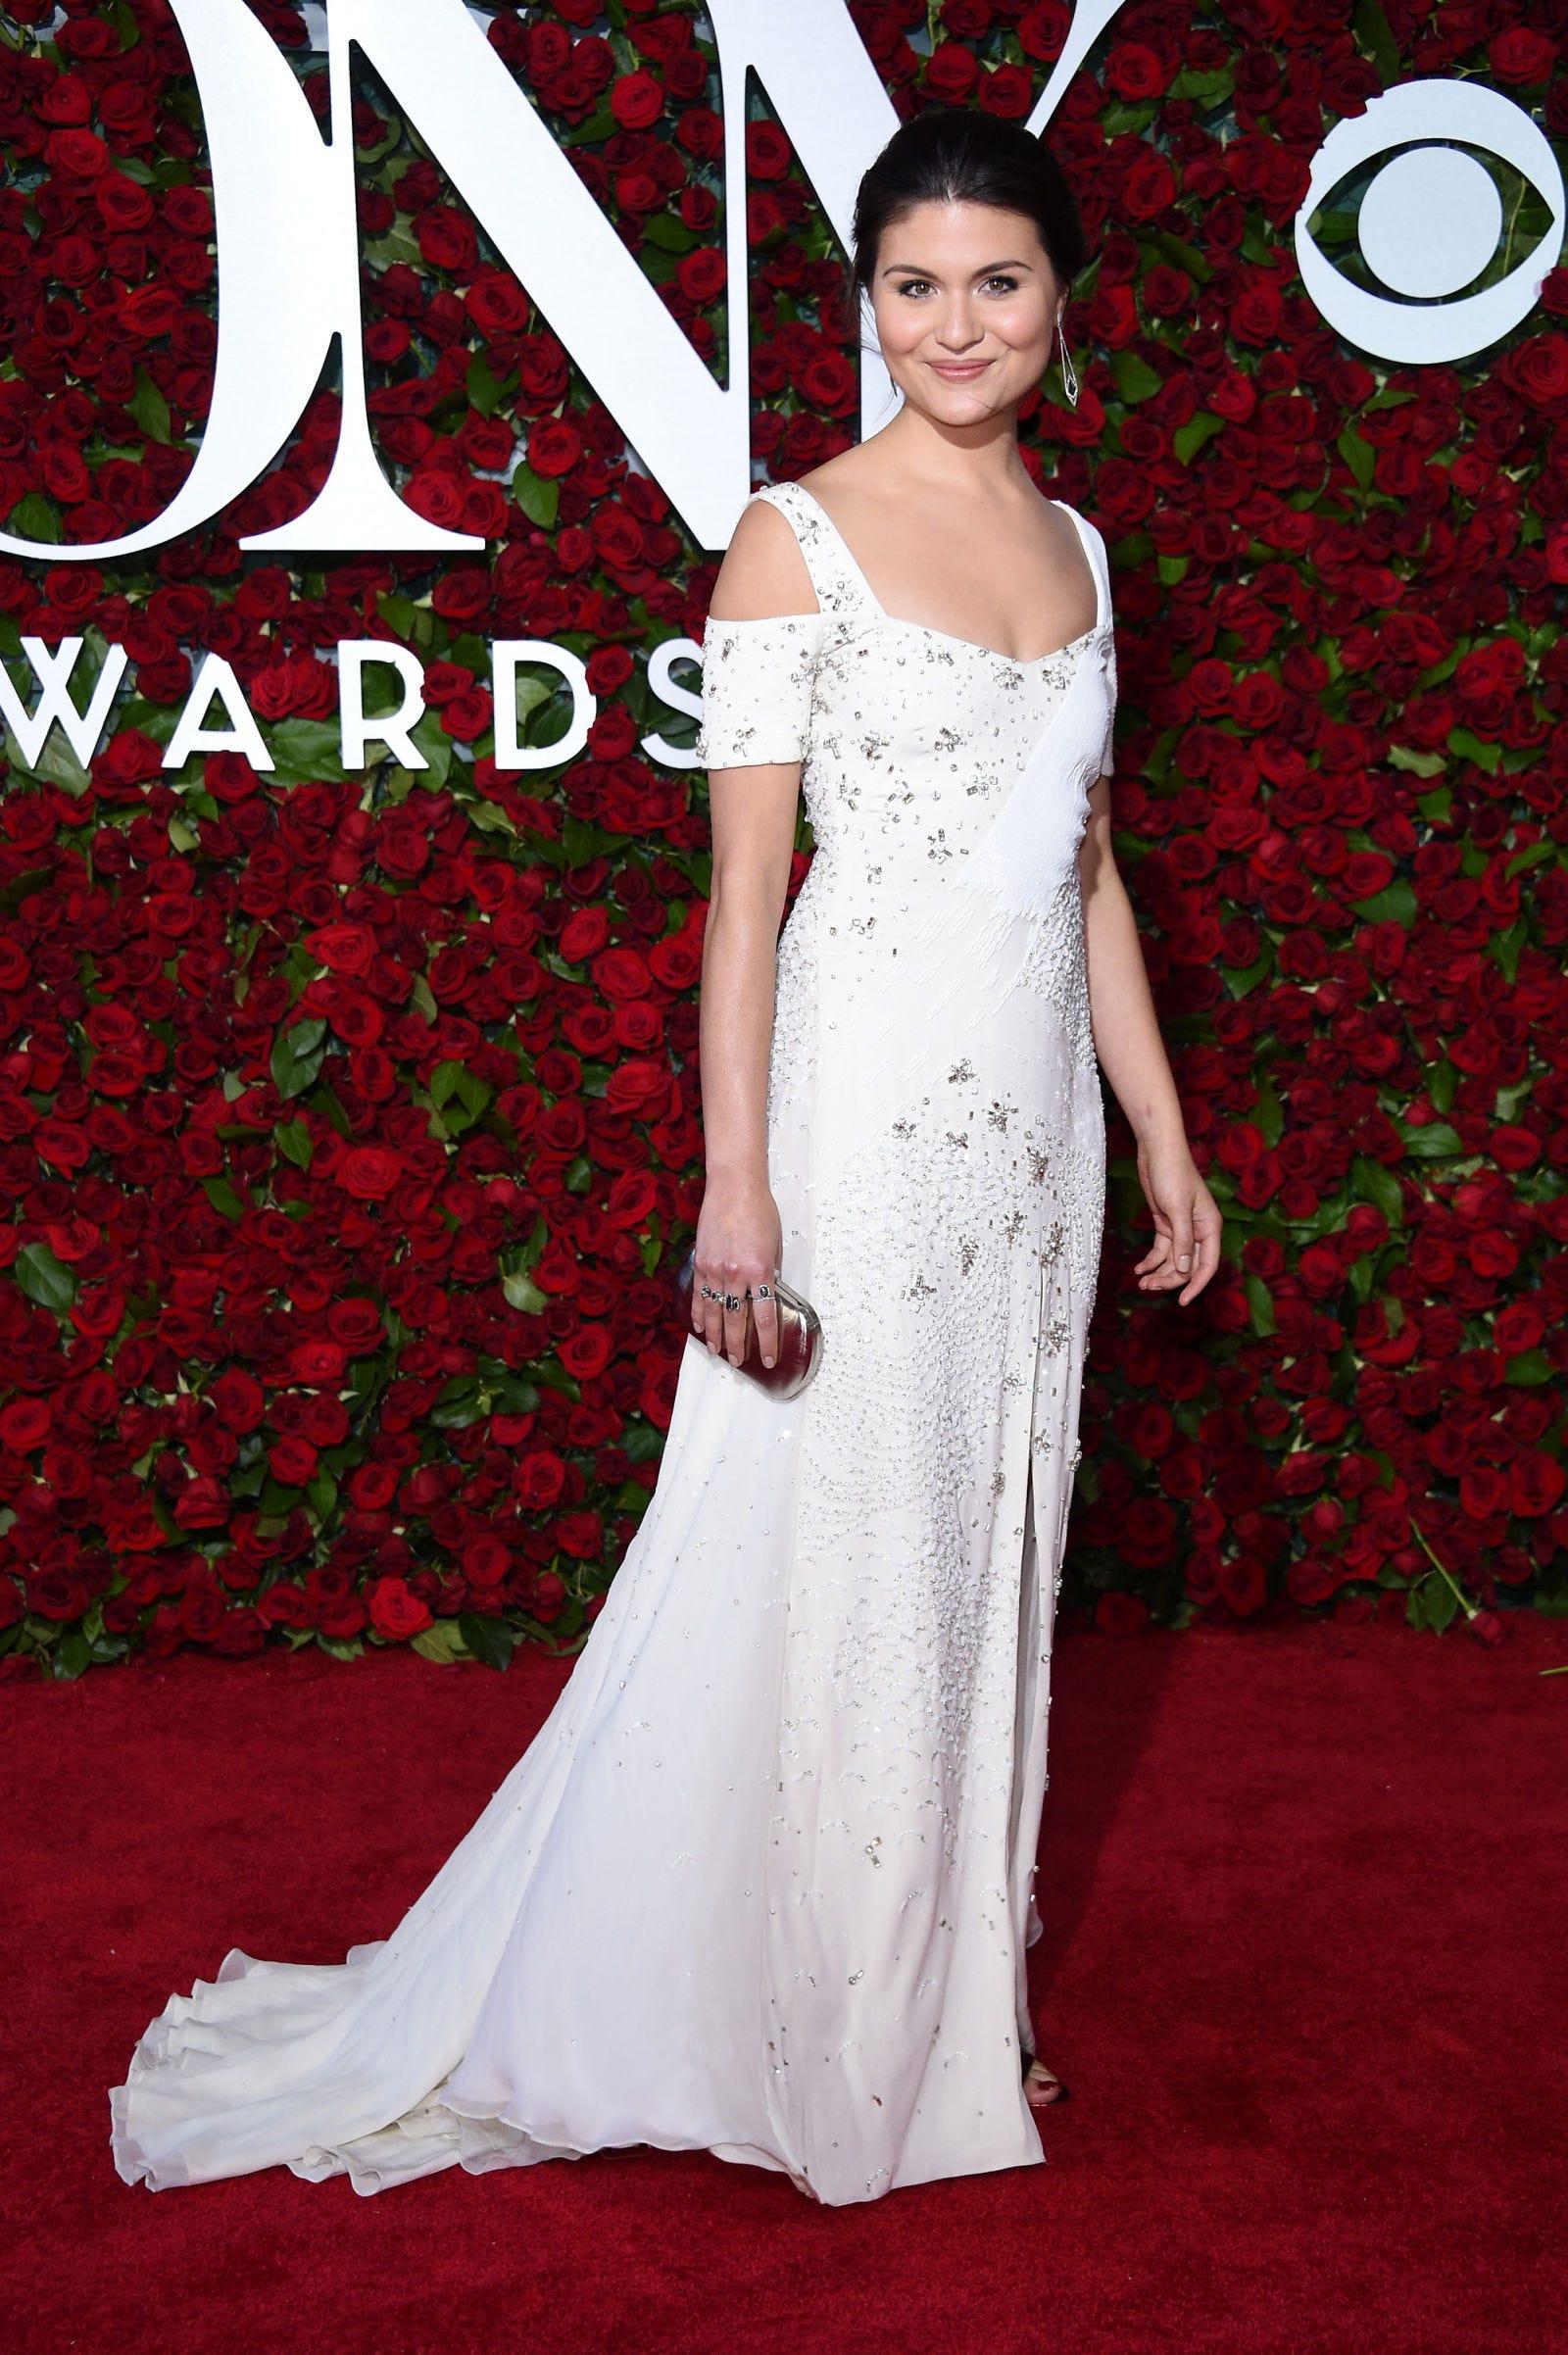 Clothing, Human, Dress, Shoulder, Red, White, Formal wear, Gown, Flooring, Carpet,